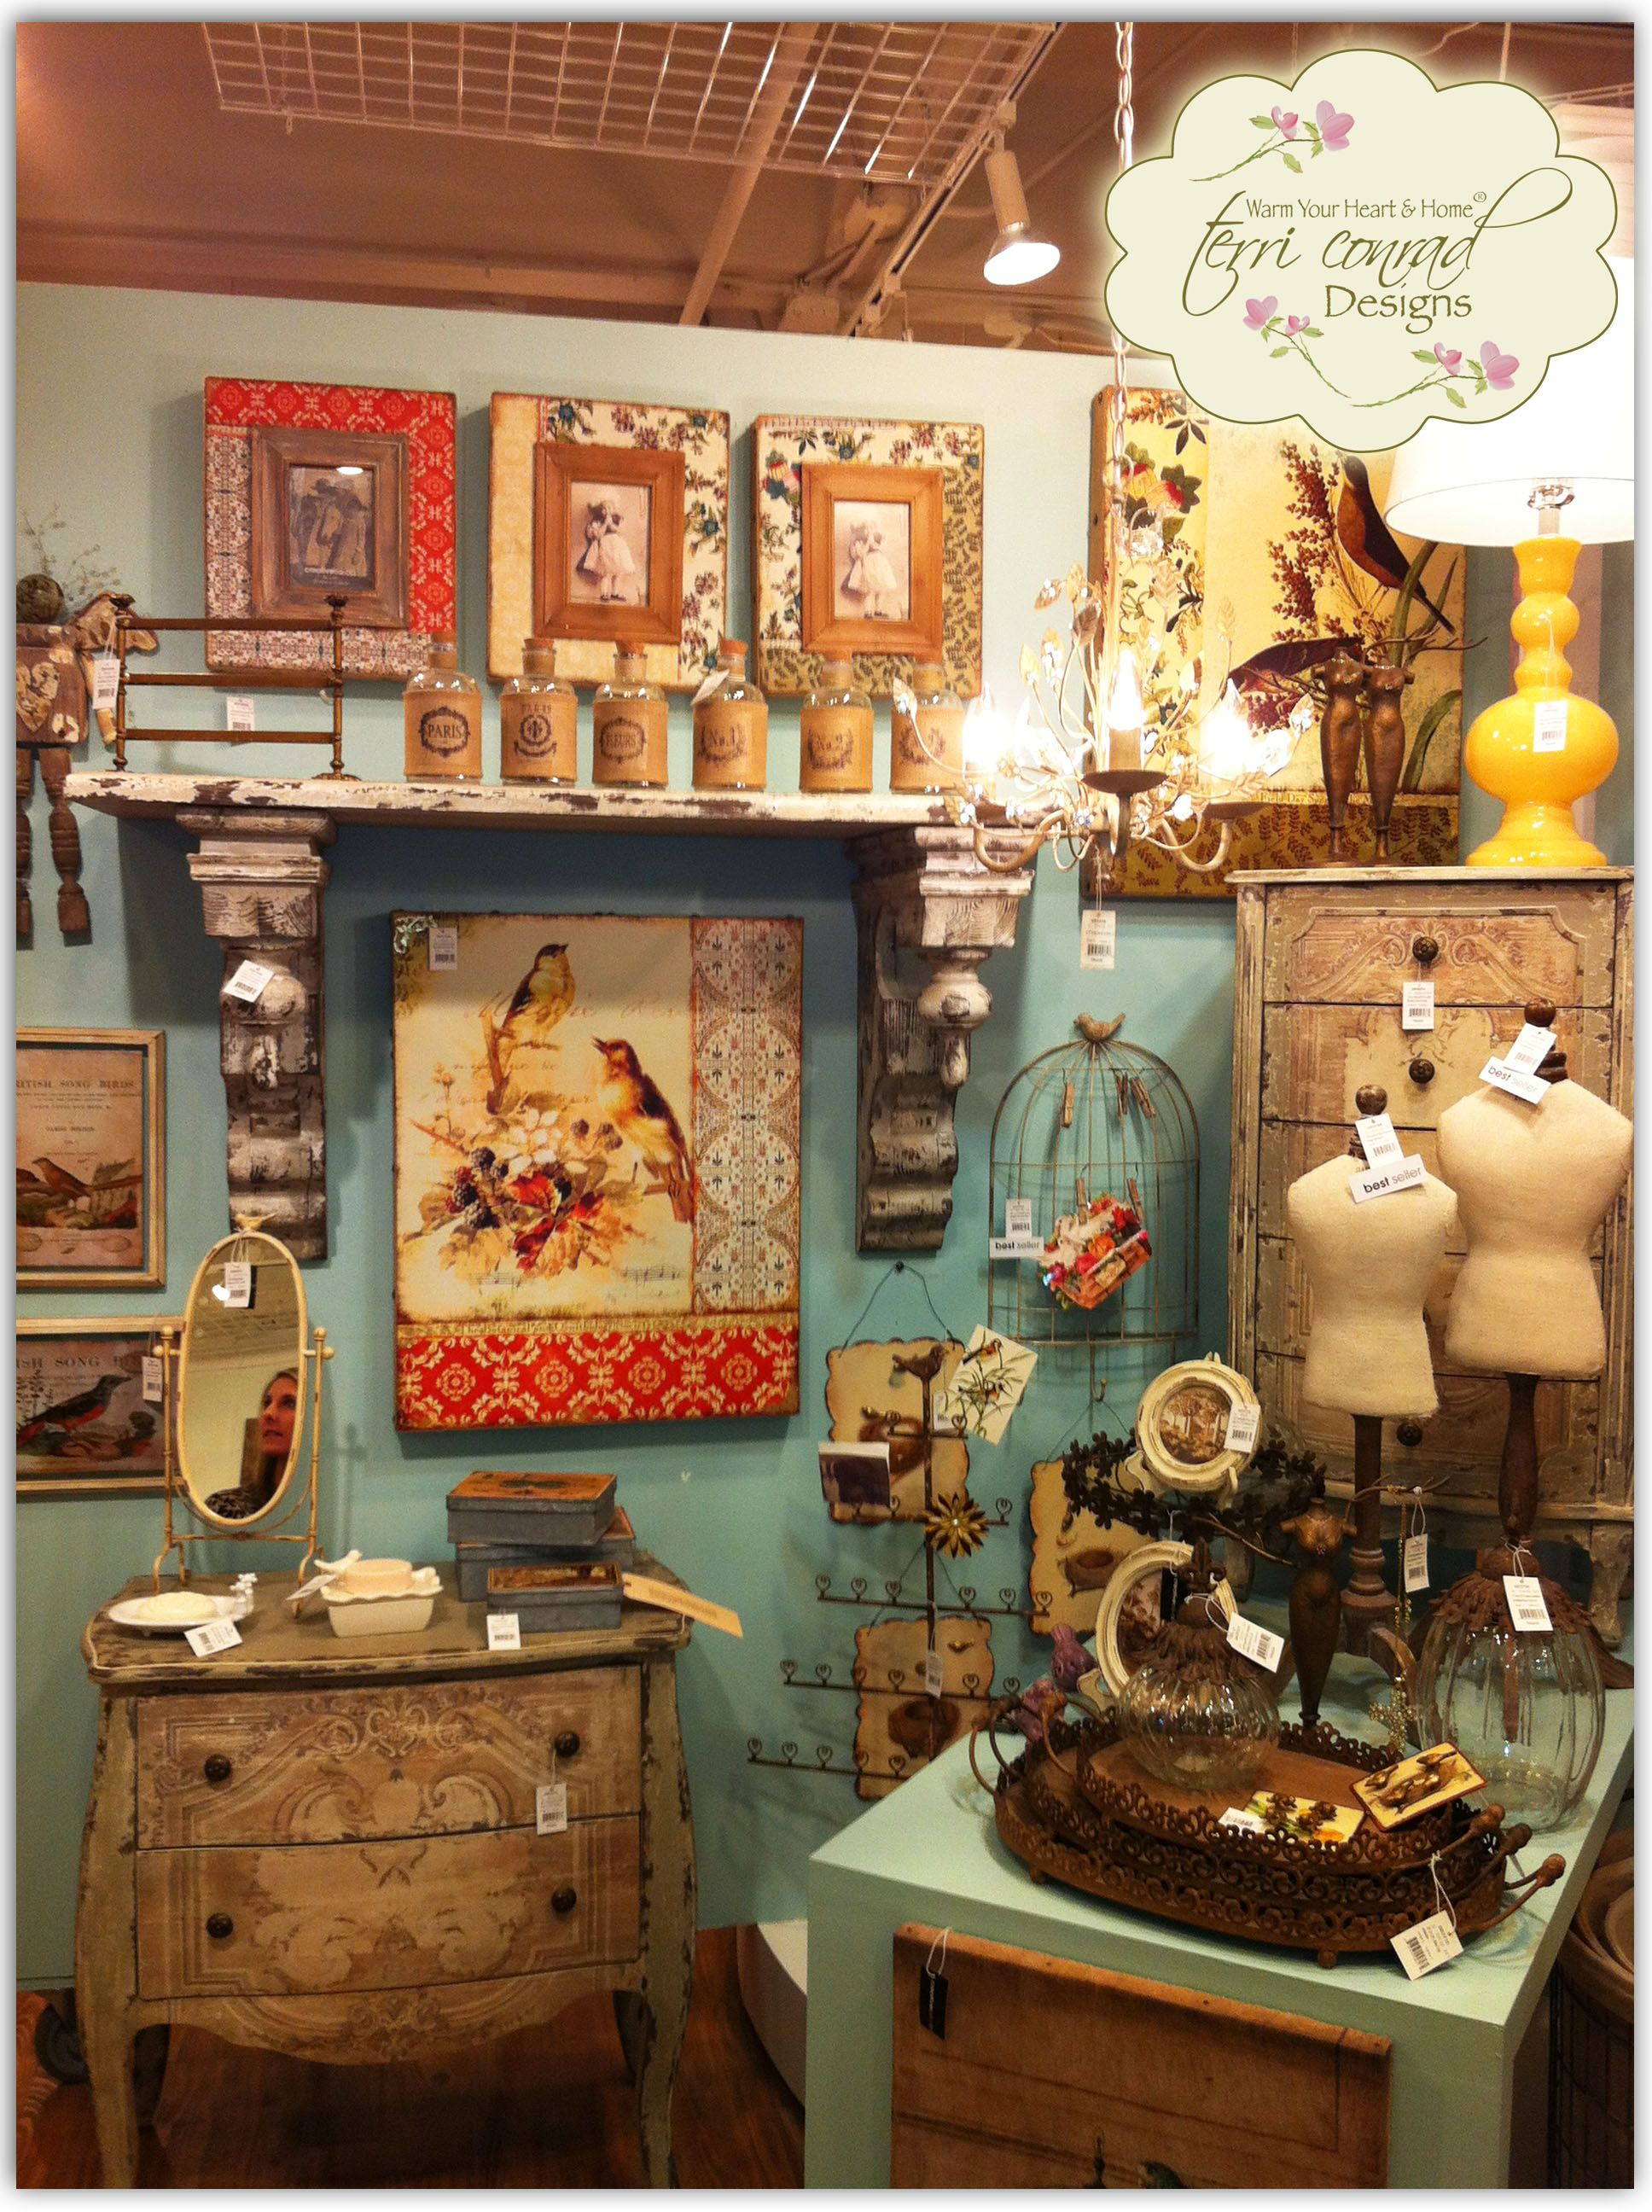 Terri Conrad Designs For Creative Co Op #vintage Inspired, #home Decor,  #birds